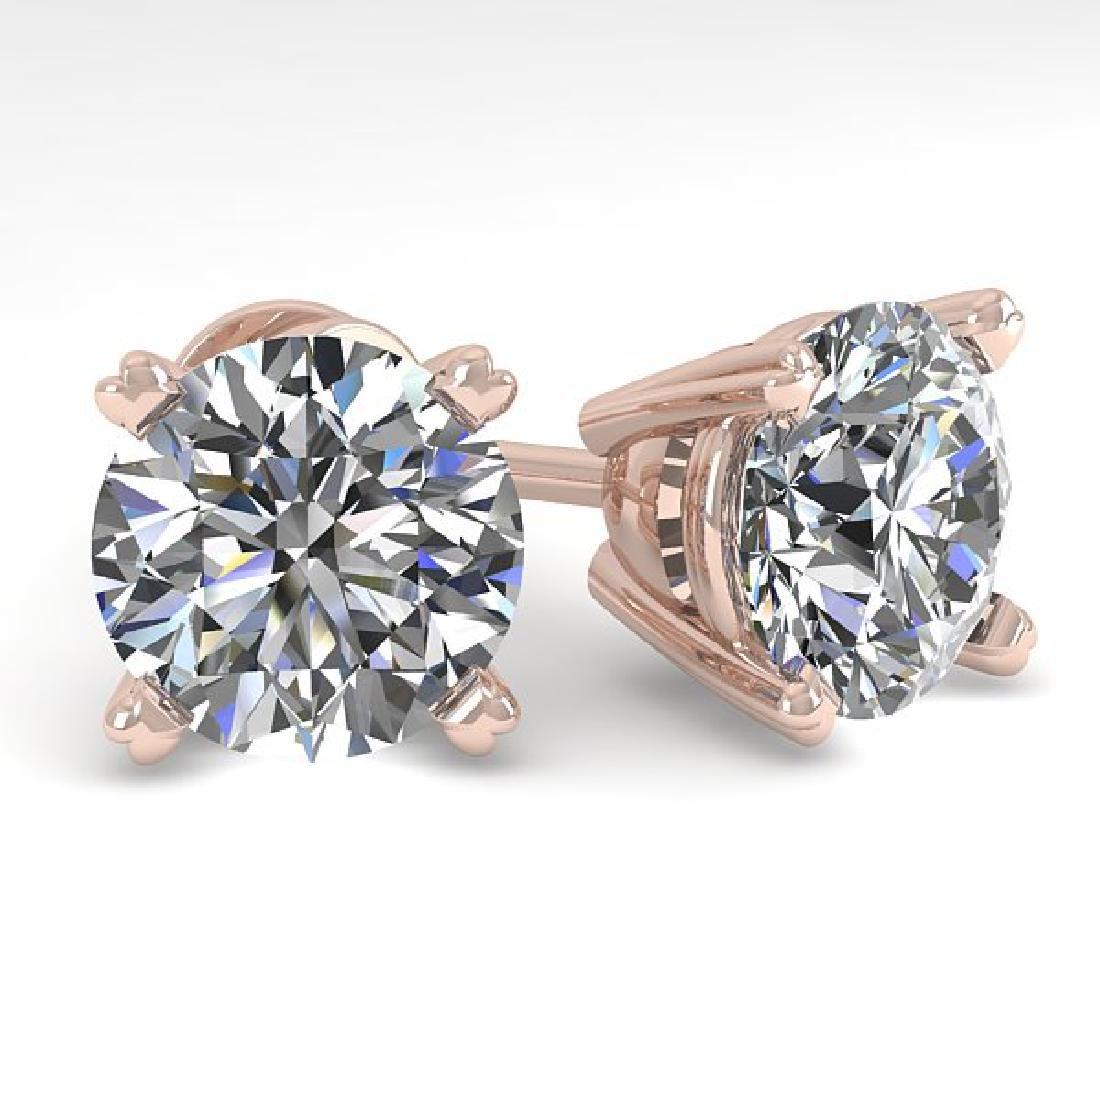 4 CTW Certified VS/SI Diamond Stud Earrings 14K Rose